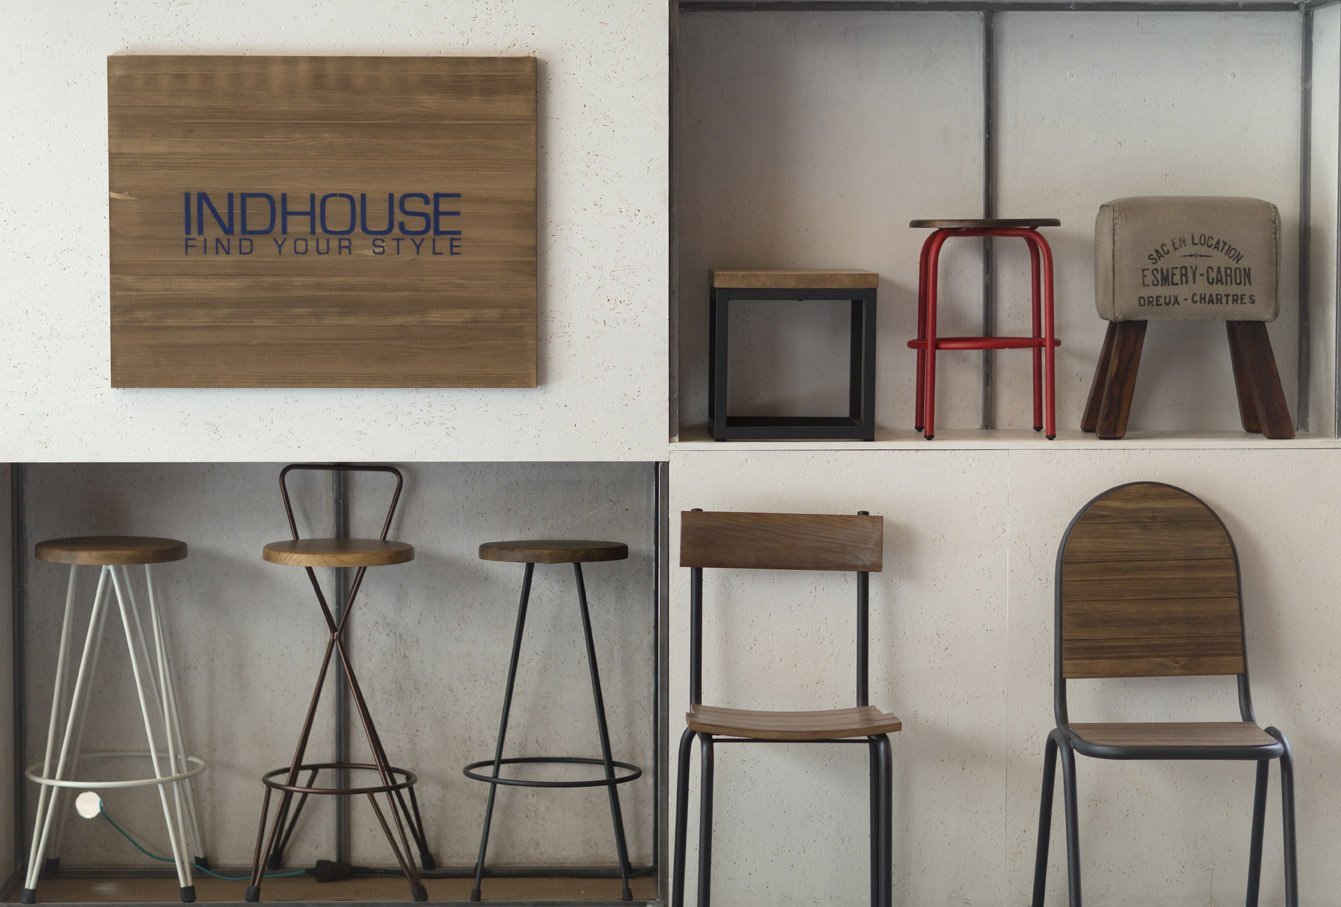 Sgabelli cucina stile industriale sedia di stile industriale in